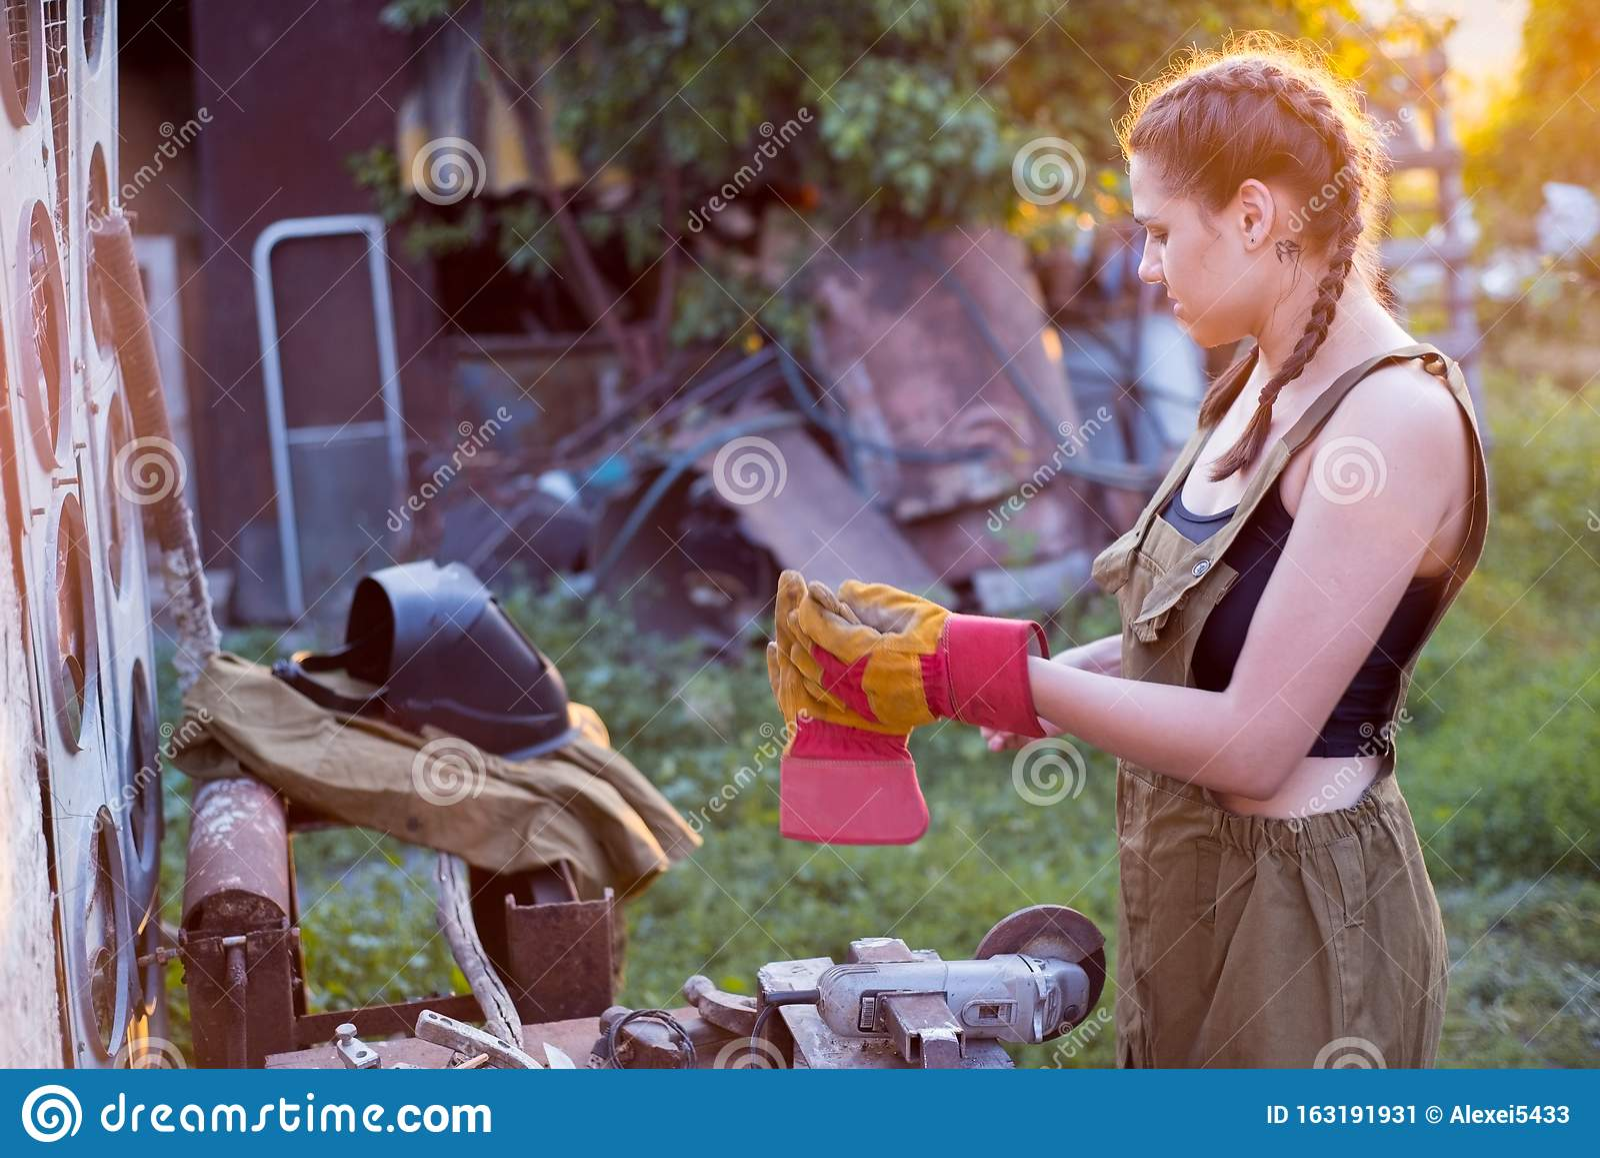 девушка занята работой